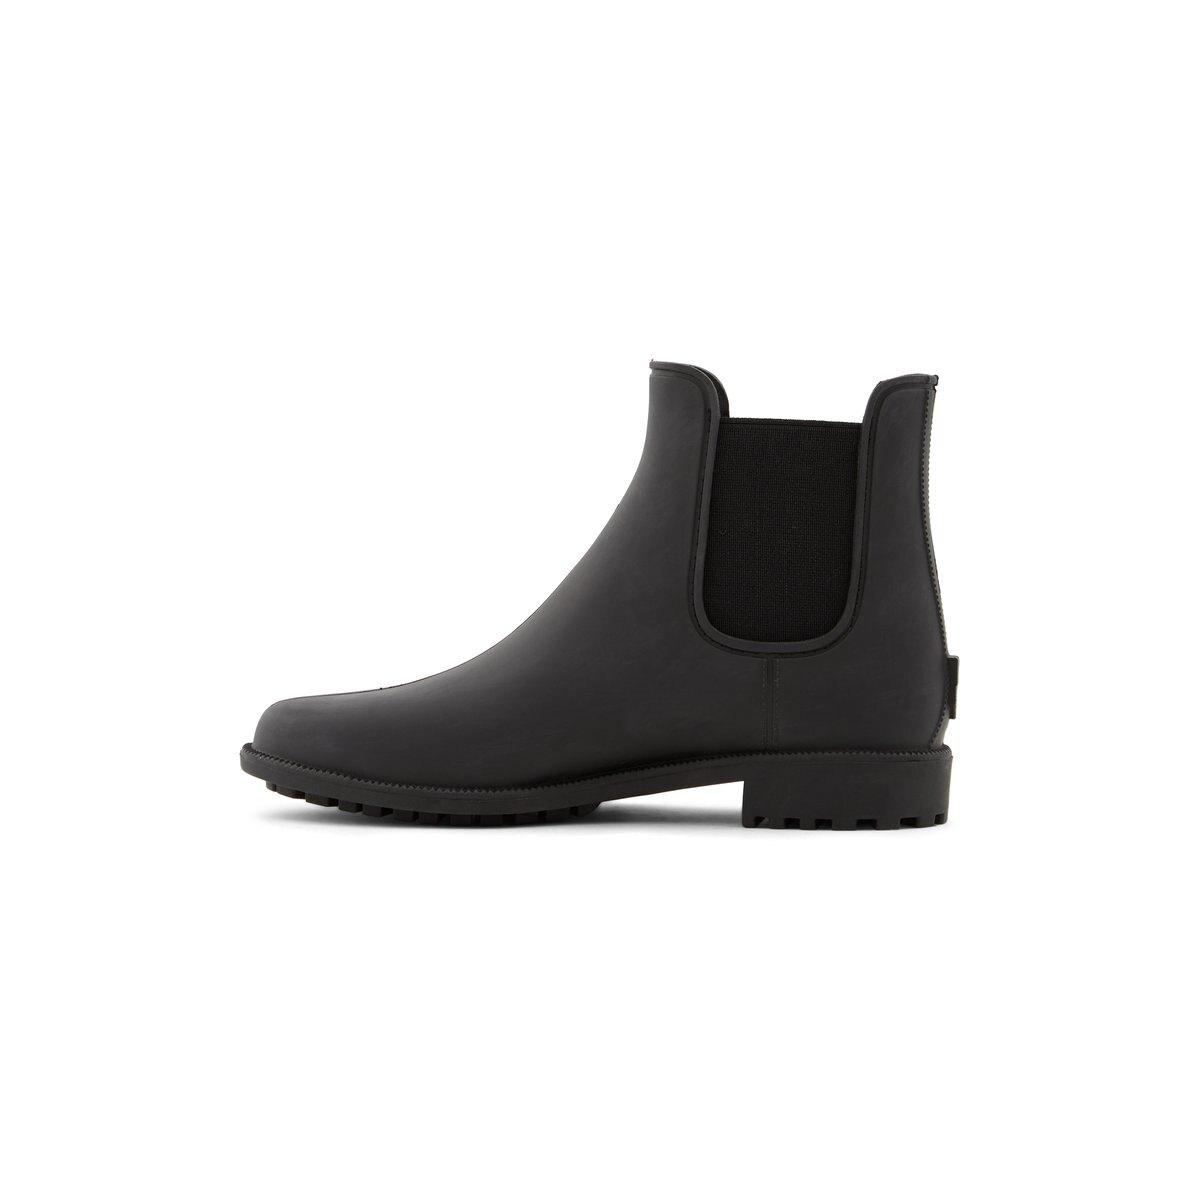 eb35633d911 Cupreus Black Women s Rain Boots